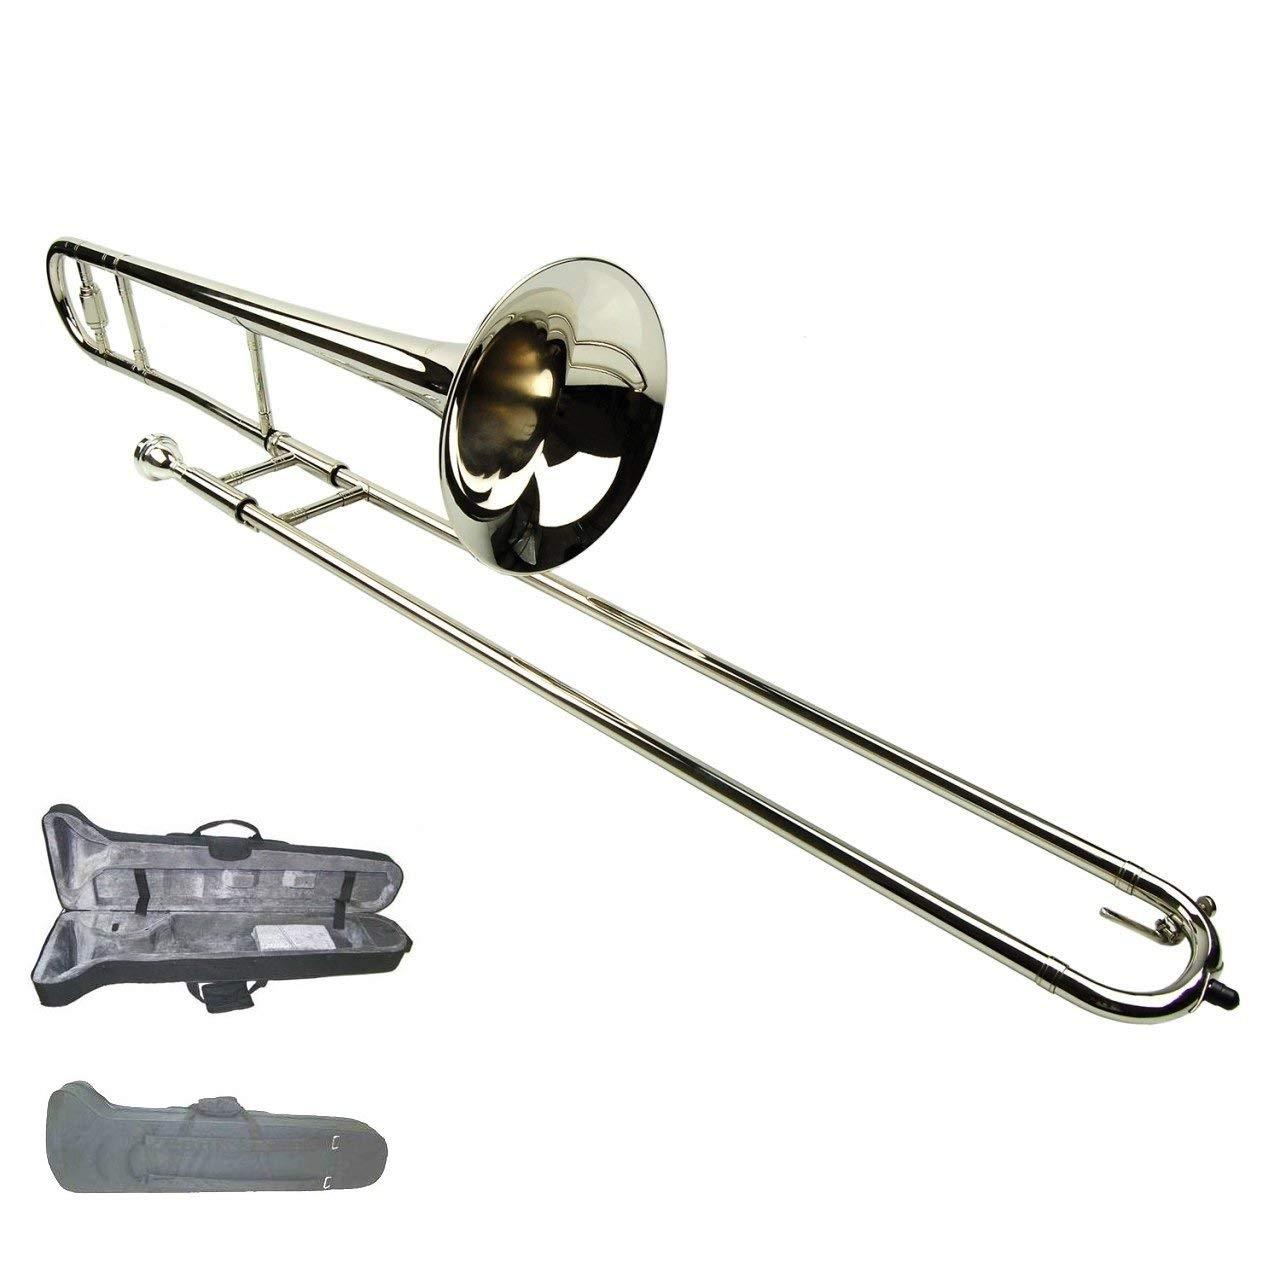 Merano Silver Nickel B Flat Tenor Slide Trombone with Zippered Carrying Case by Merano